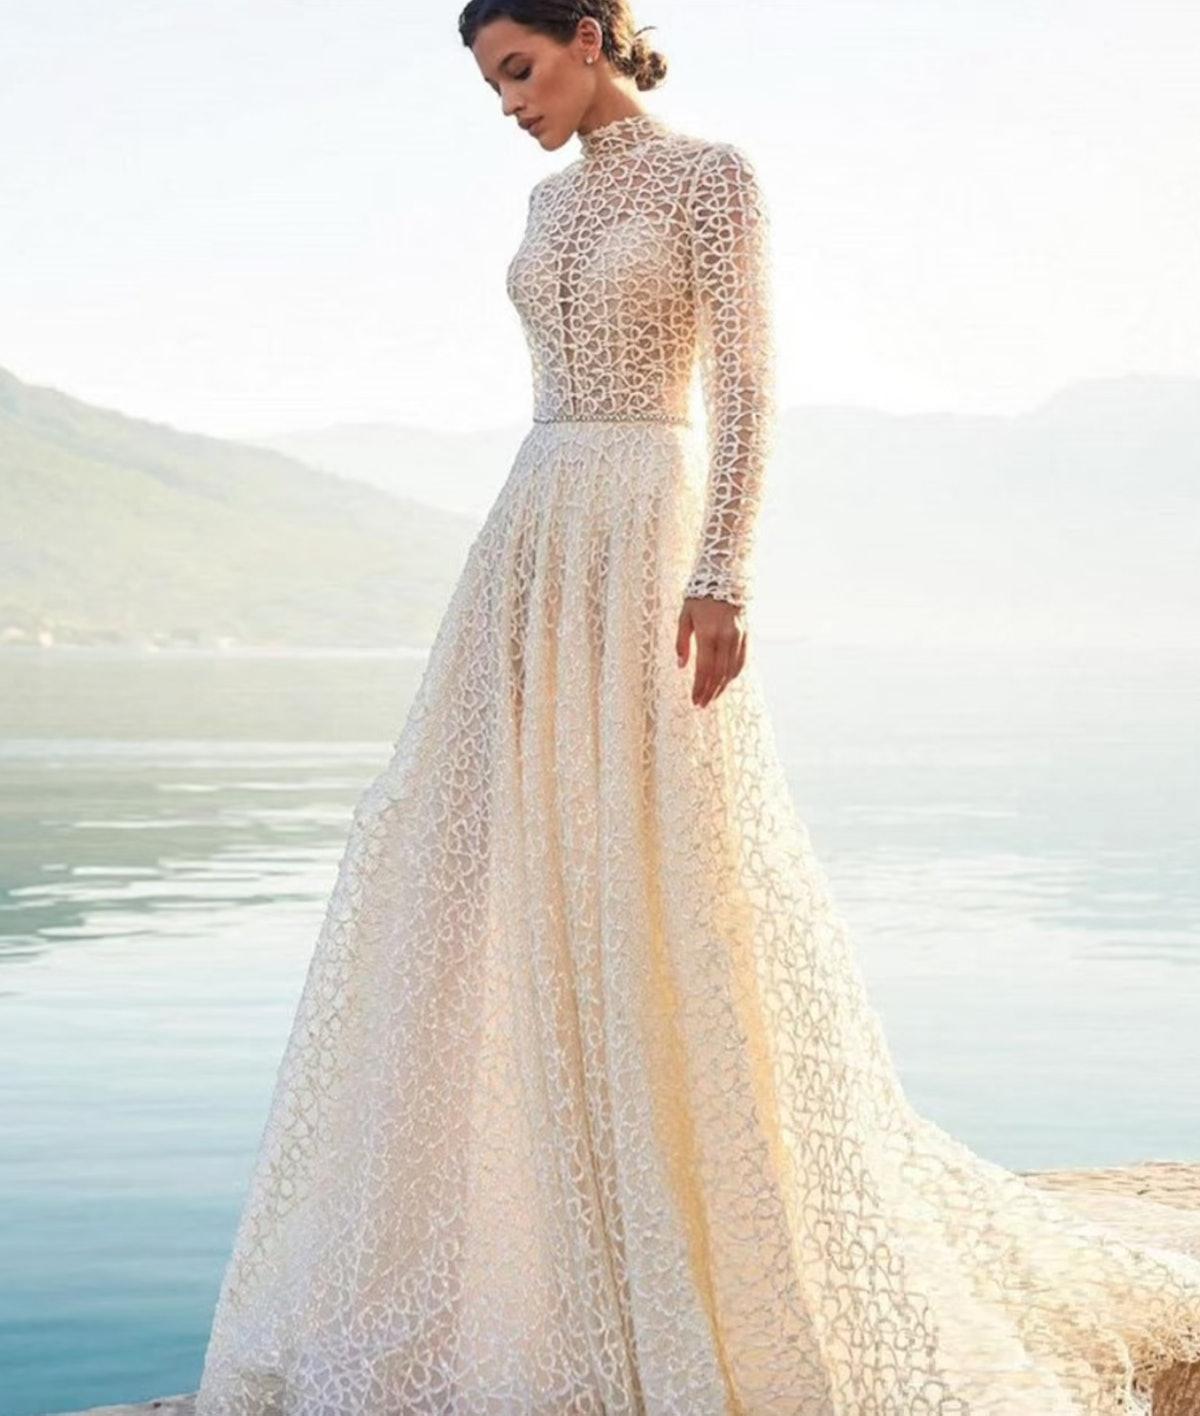 Etsy High-Neck Wedding Dress